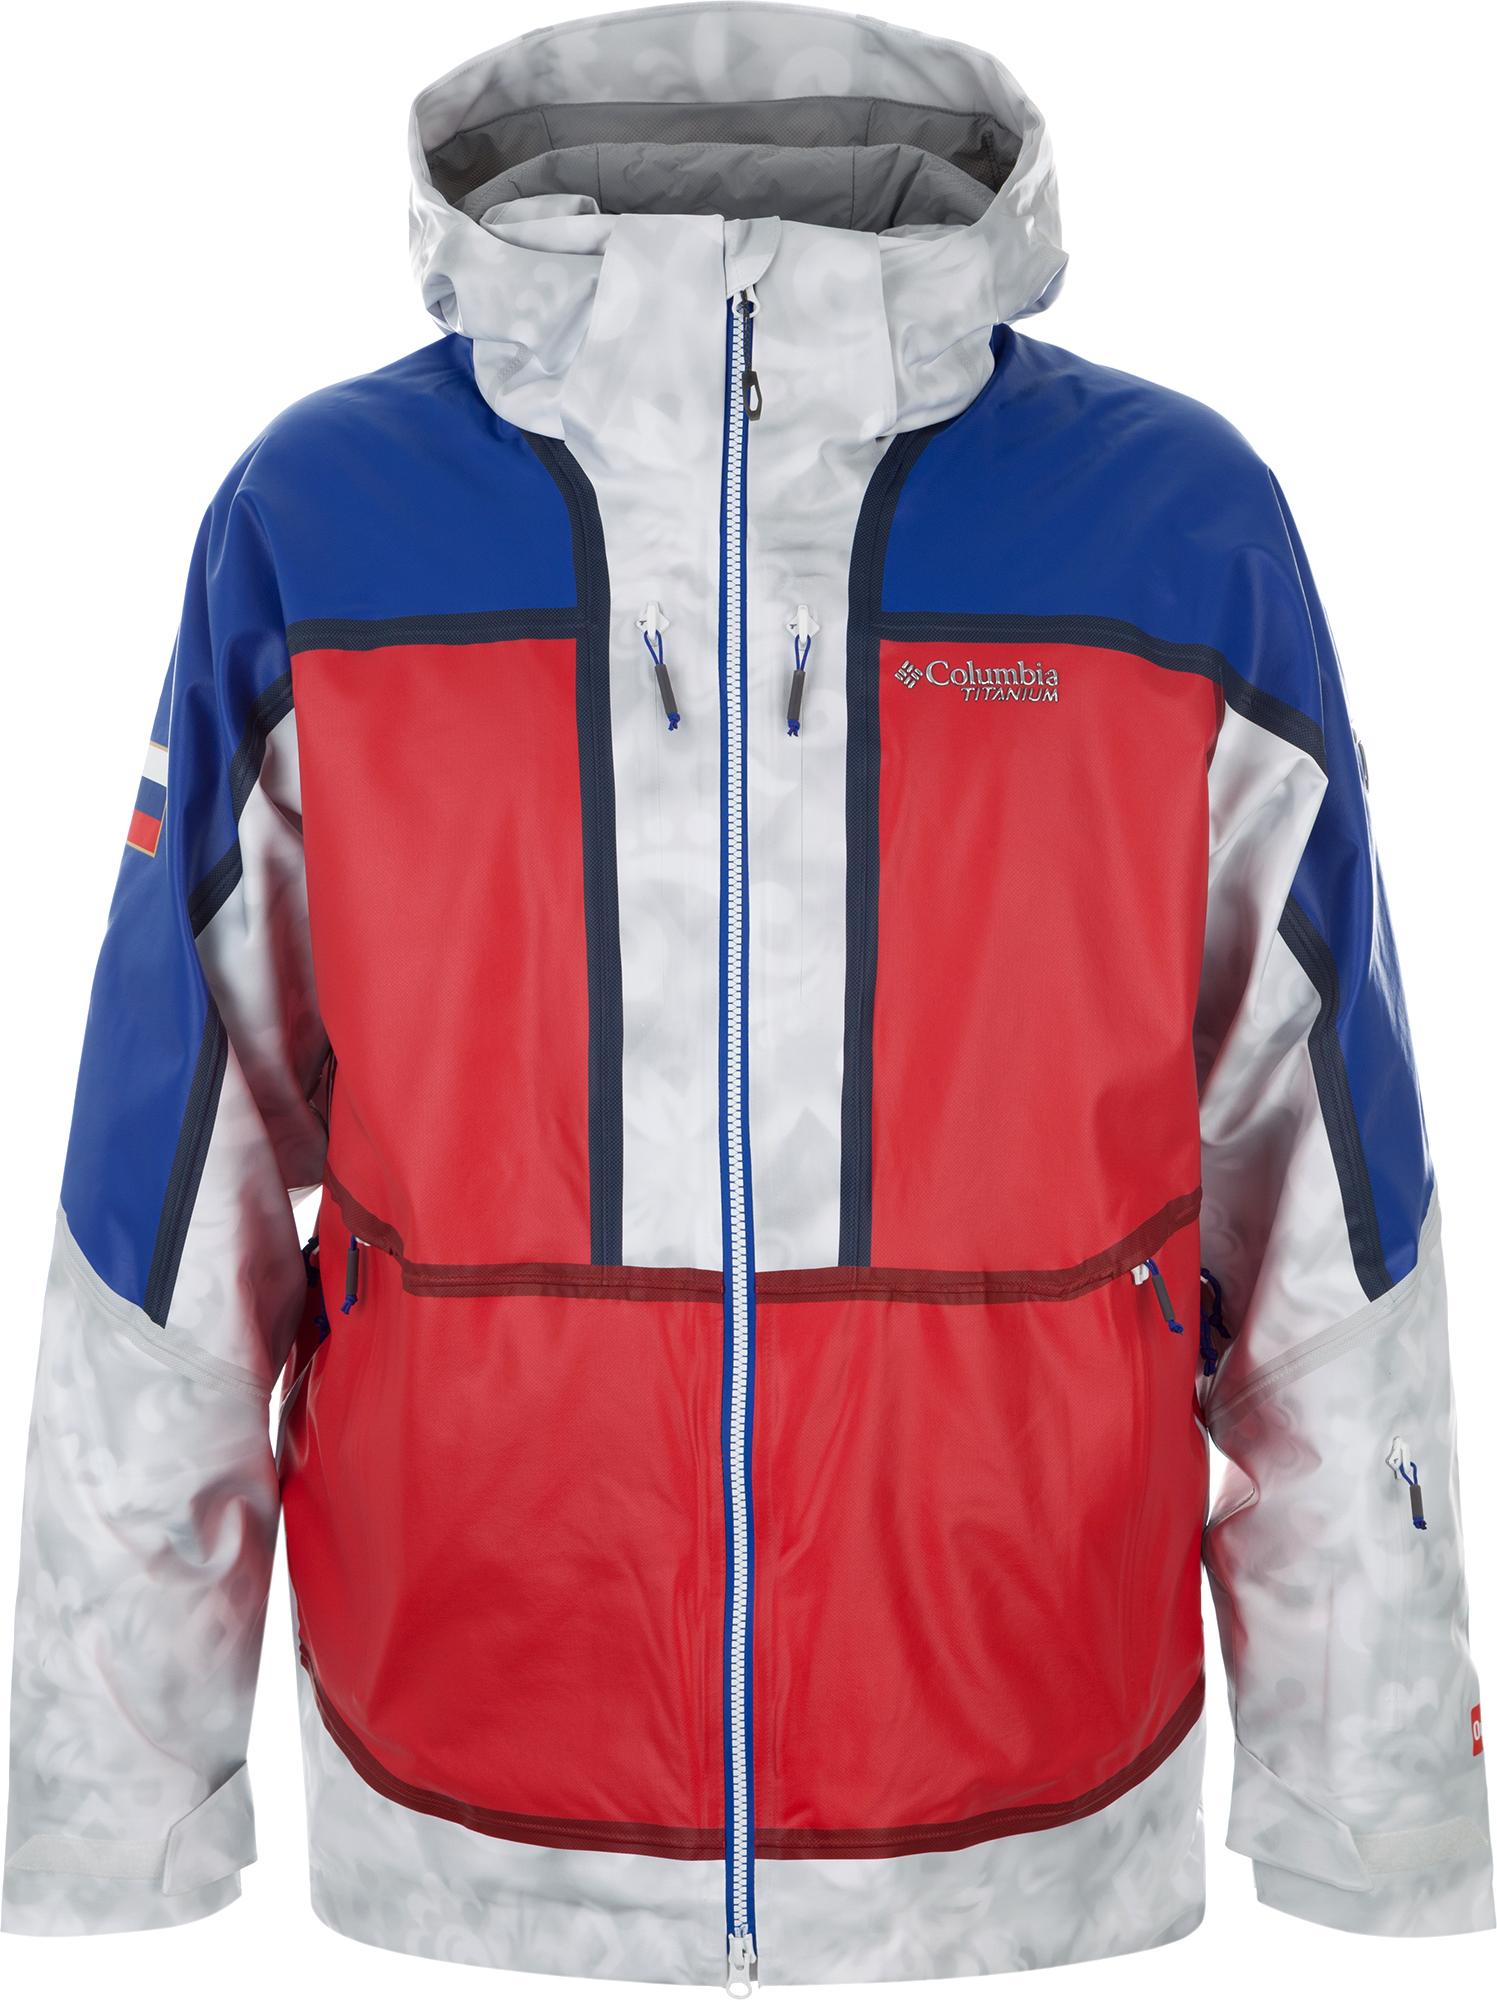 Columbia Куртка утепленная мужская Columbia 5OutDry Ex Mogul куртка утепленная для мальчиков columbia lost brook columbia